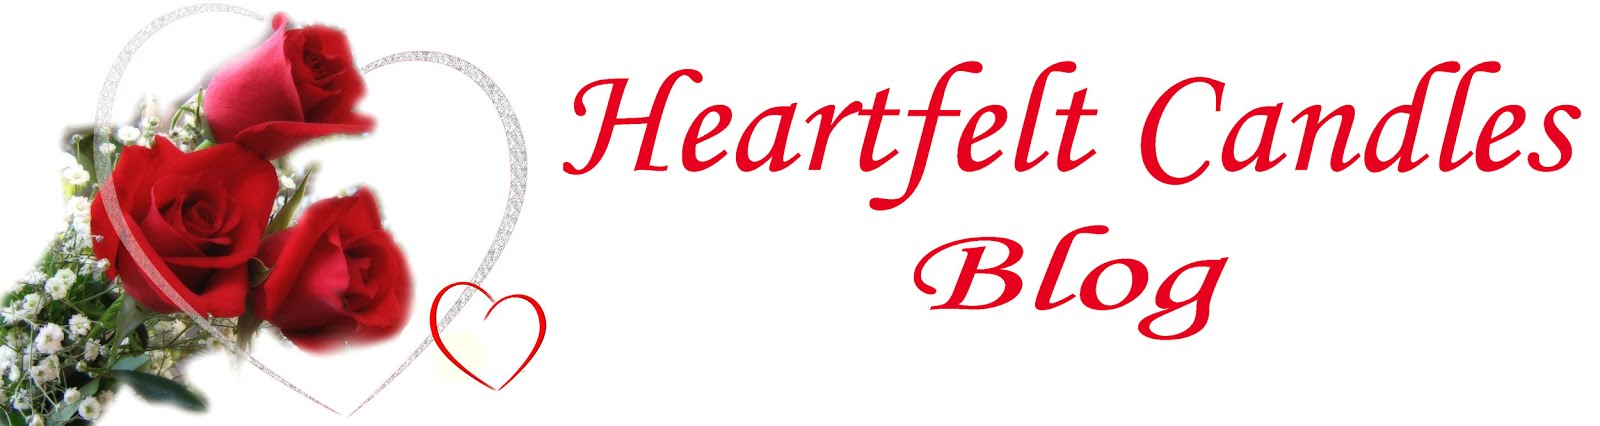 Heartfelt Candles Blog